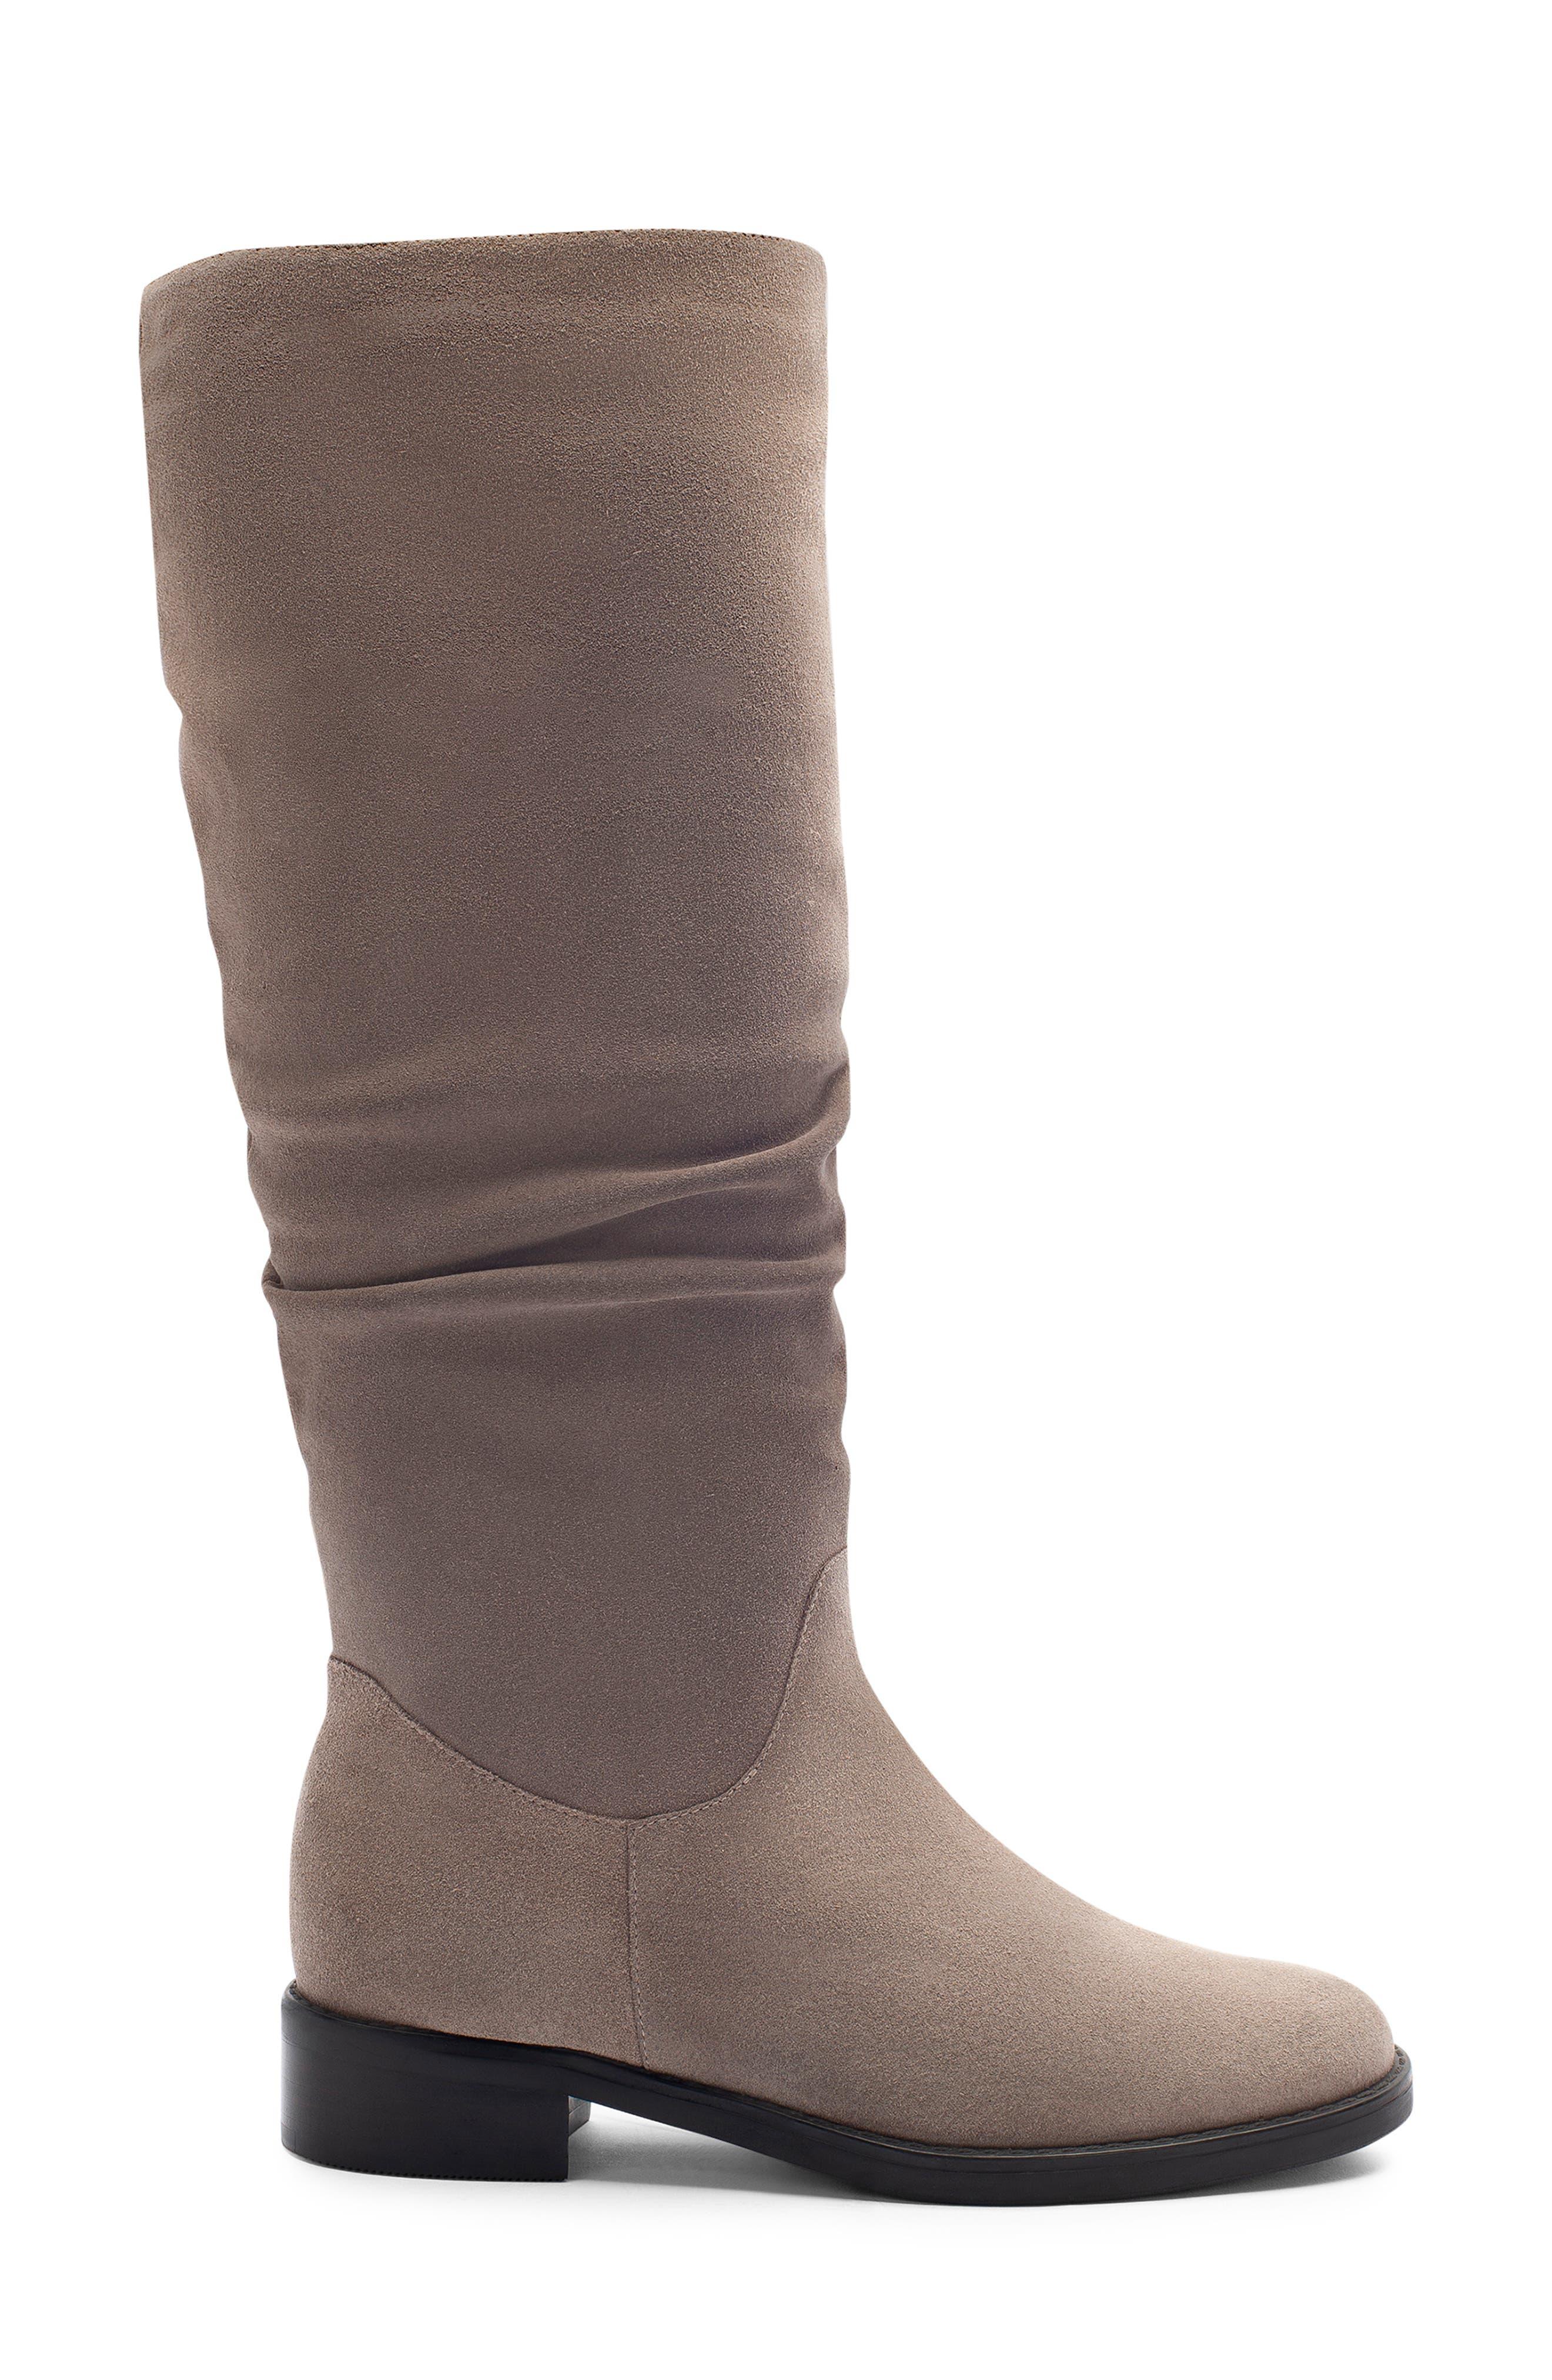 Erika Waterproof Knee High Boot,                             Alternate thumbnail 3, color,                             DARK TAUPE SUEDE